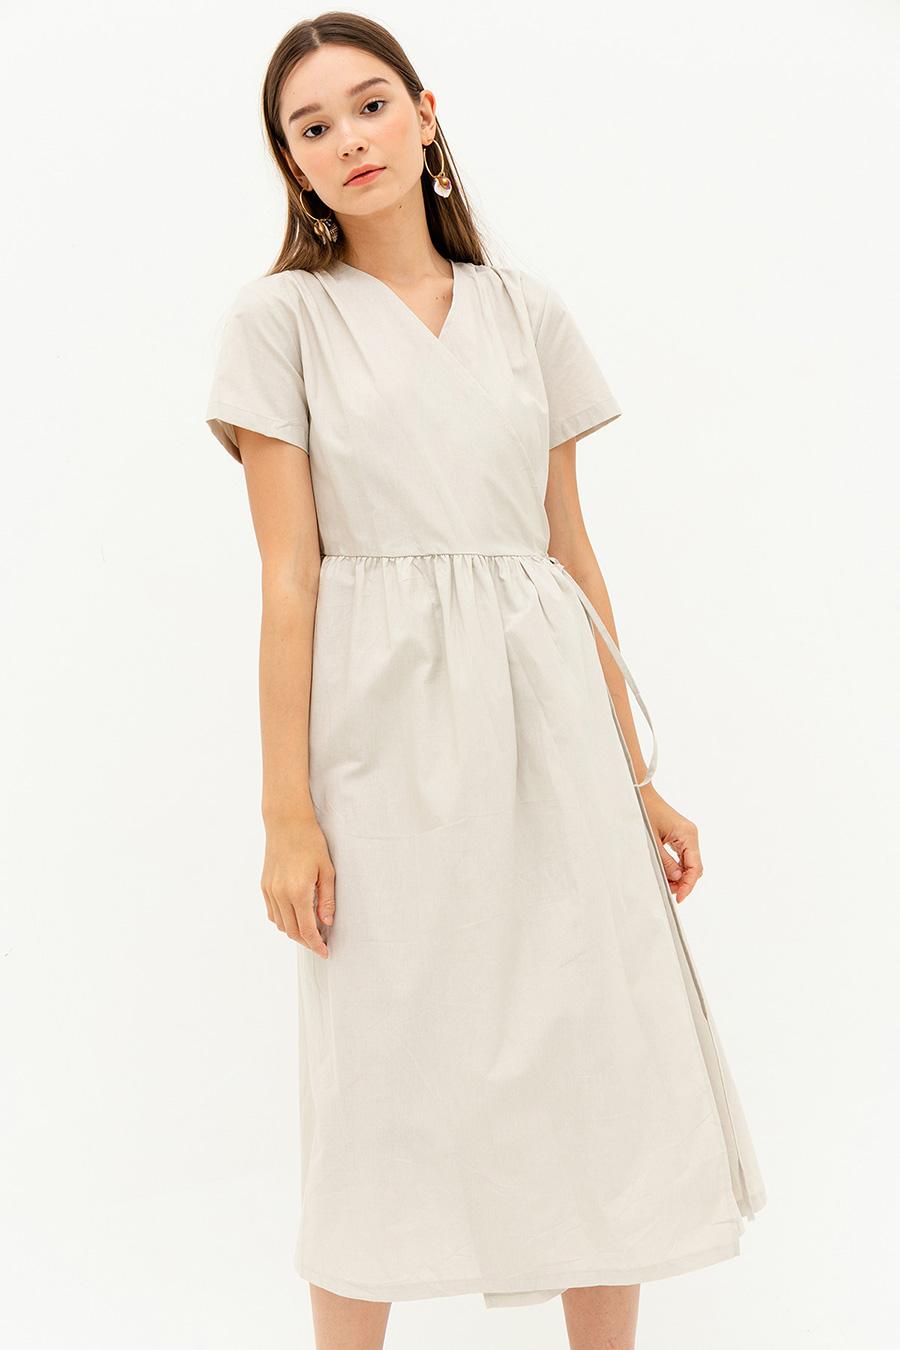 LILYANA DRESS - BISCOTTI